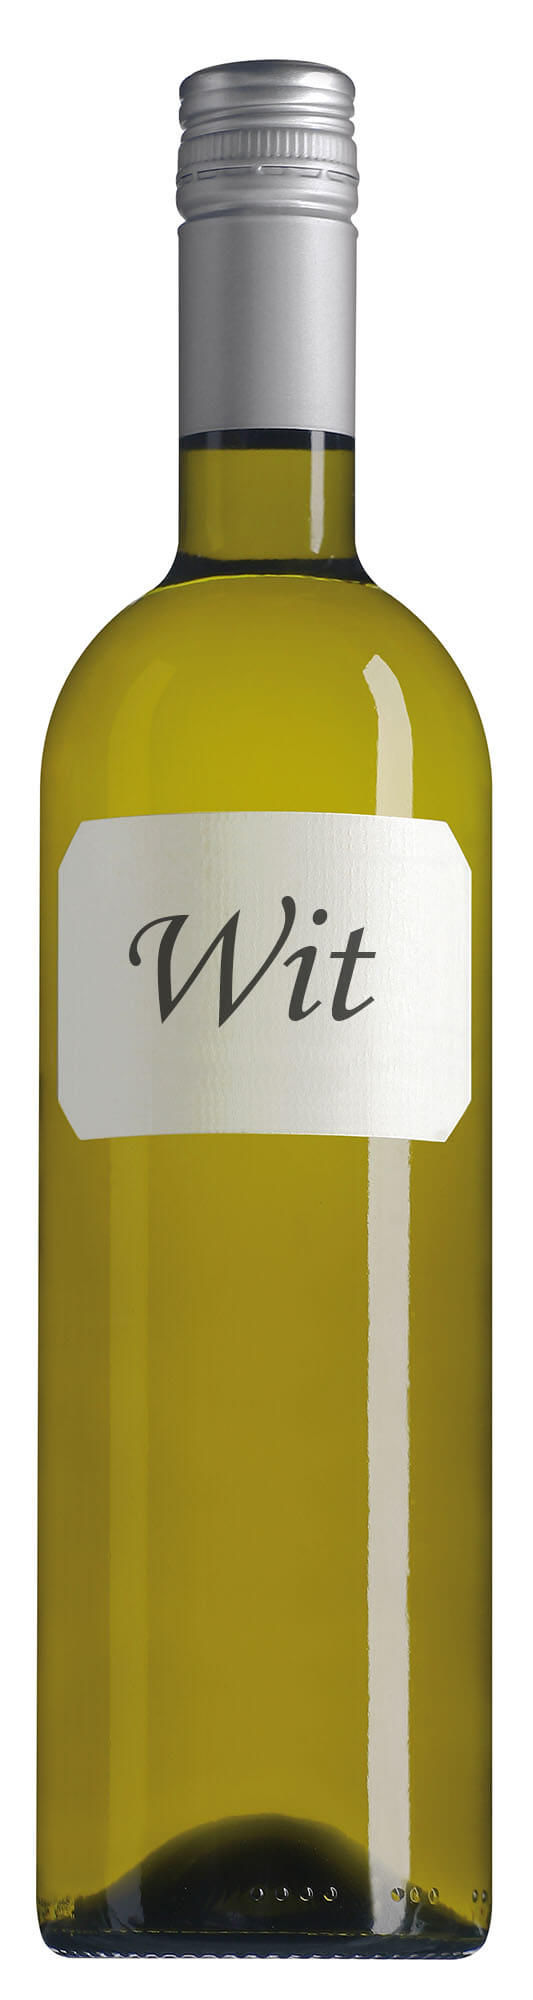 Terrazas Altos Del Plata Chardonnay Van Der Heijden Wijnen